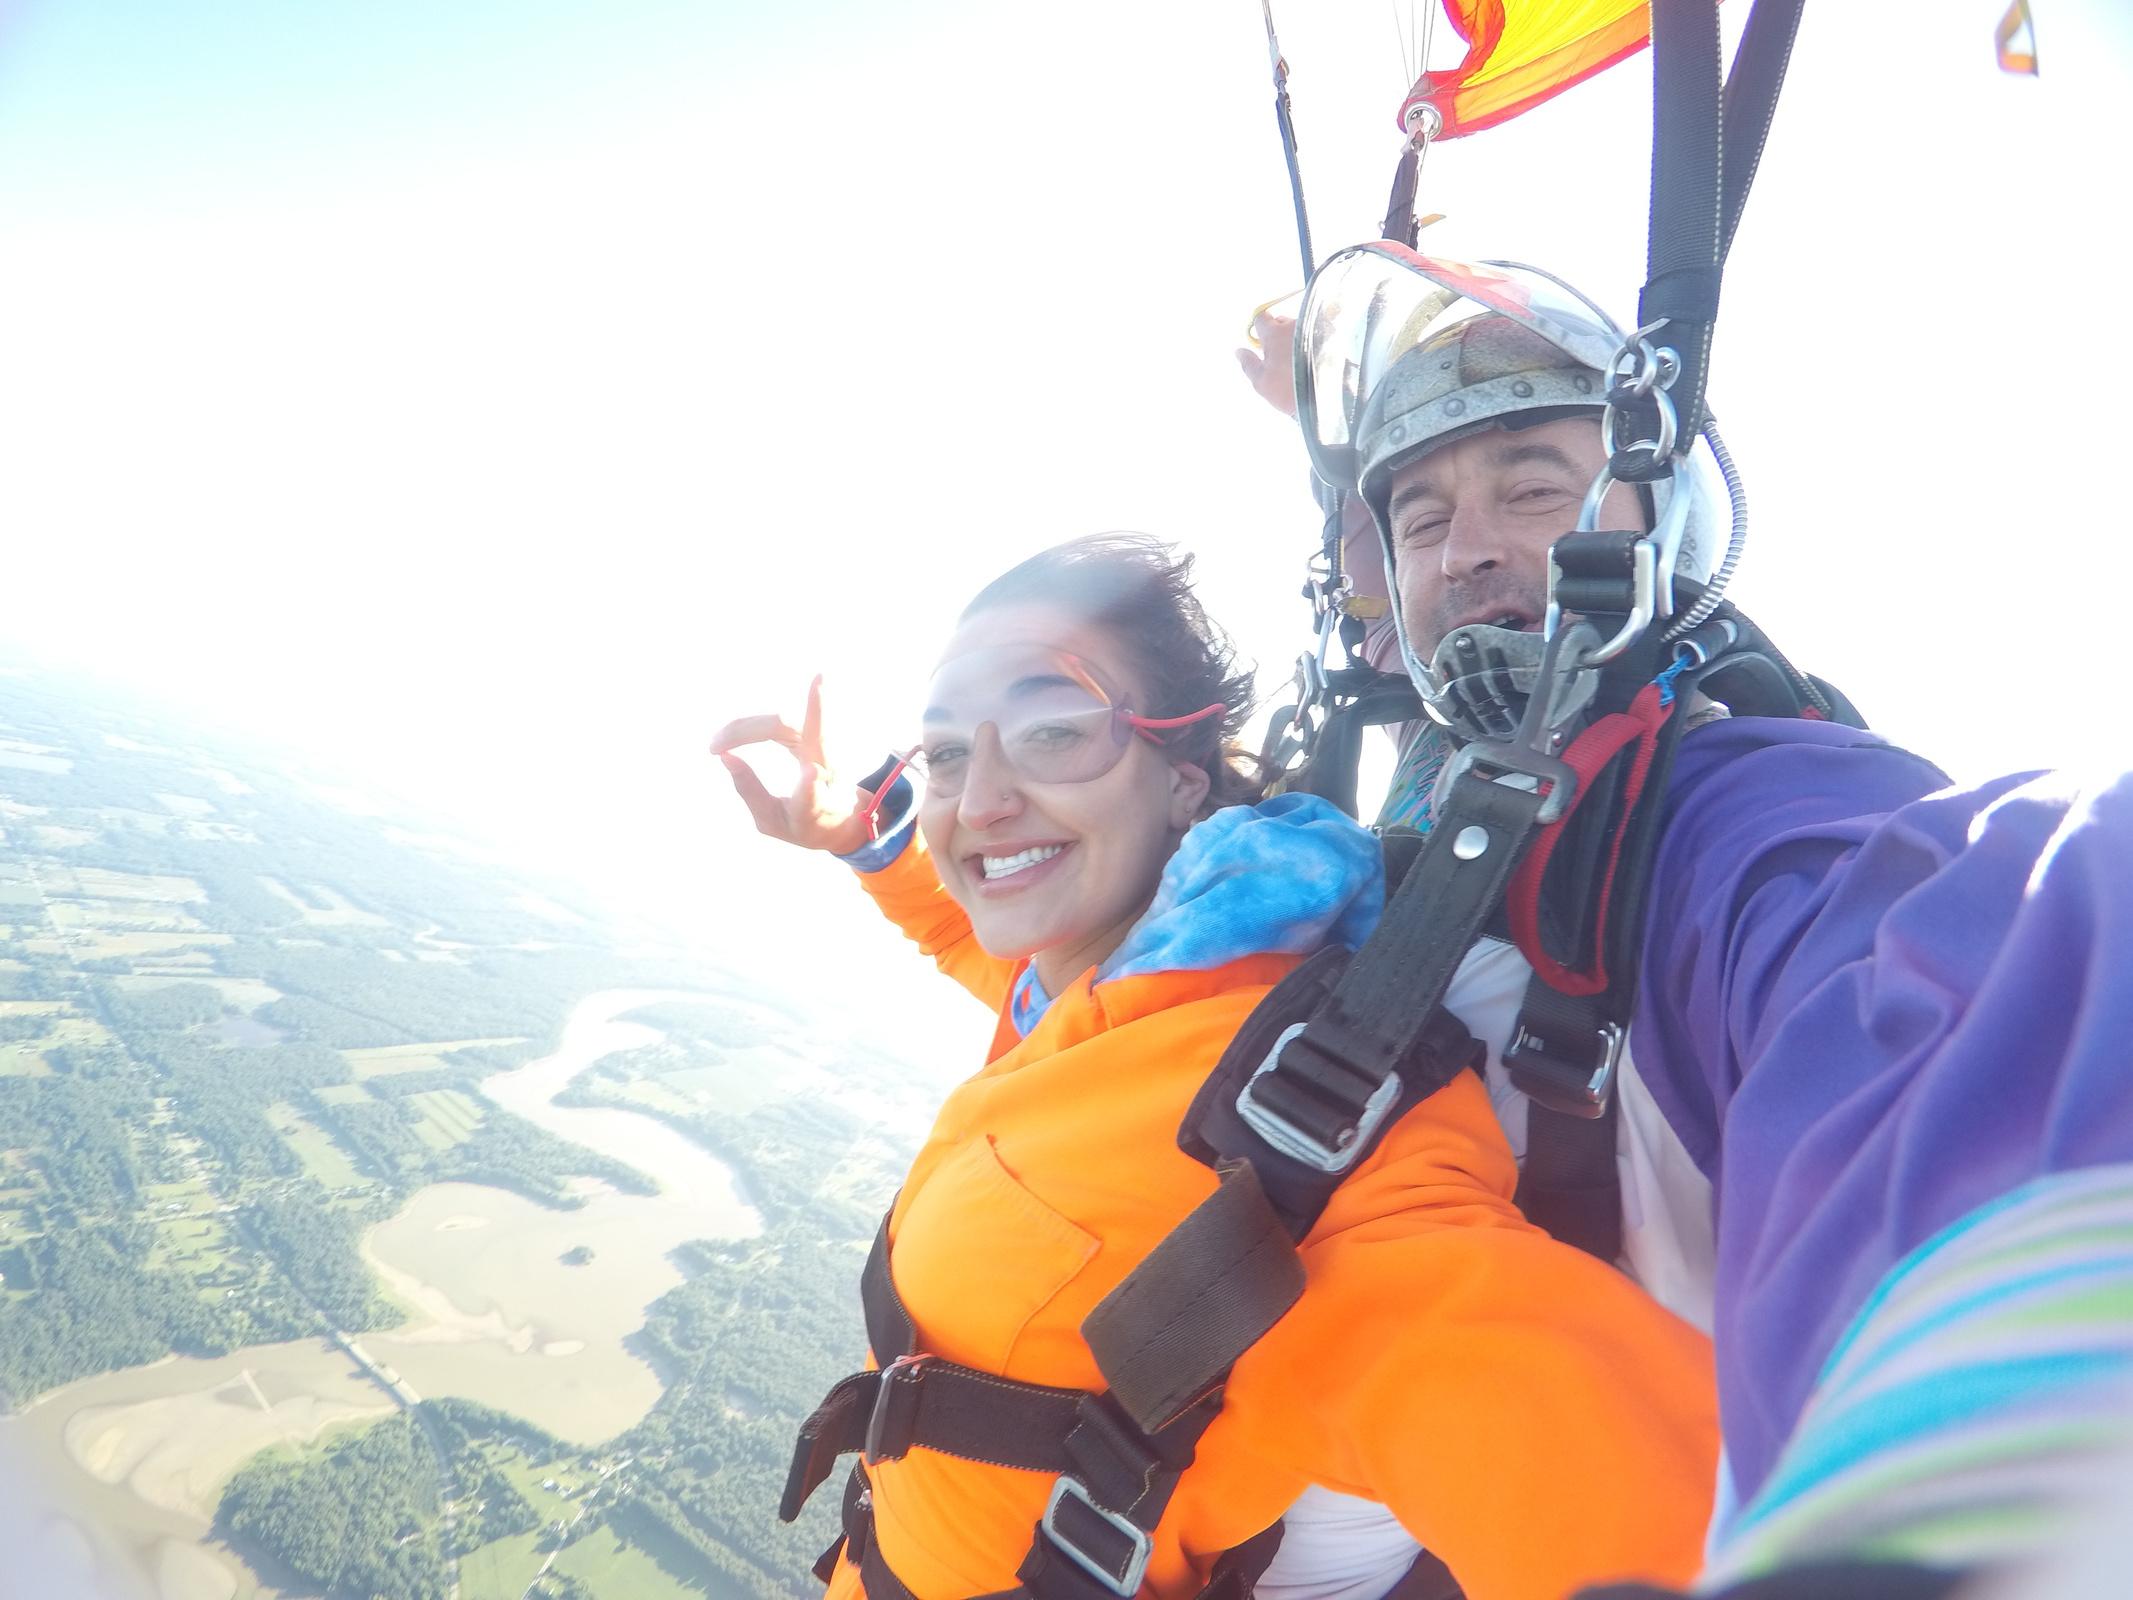 Brianna Miller Skydive162